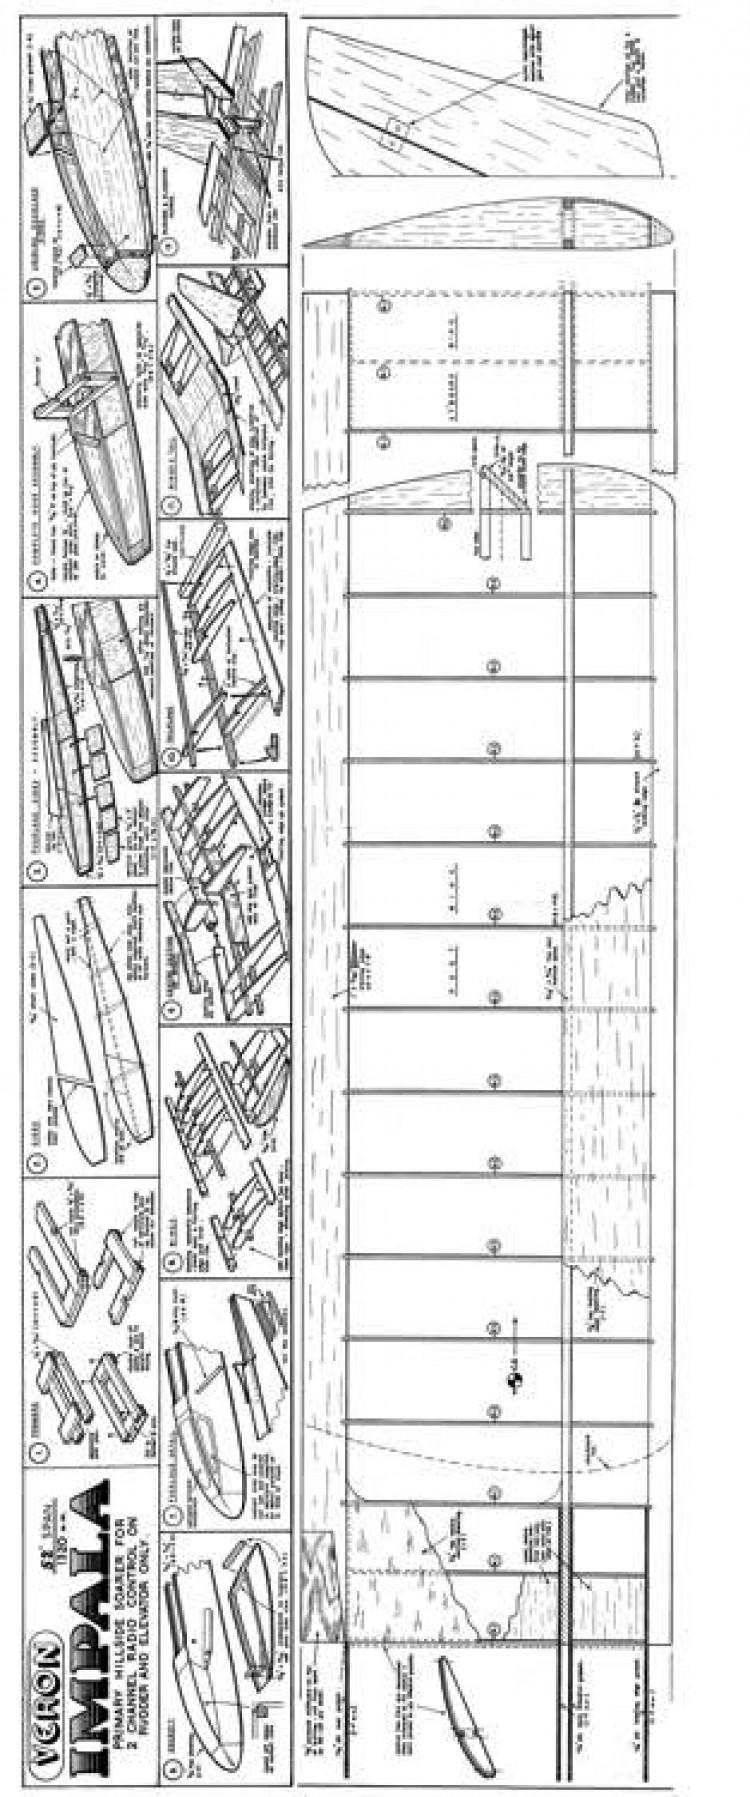 Impala model airplane plan